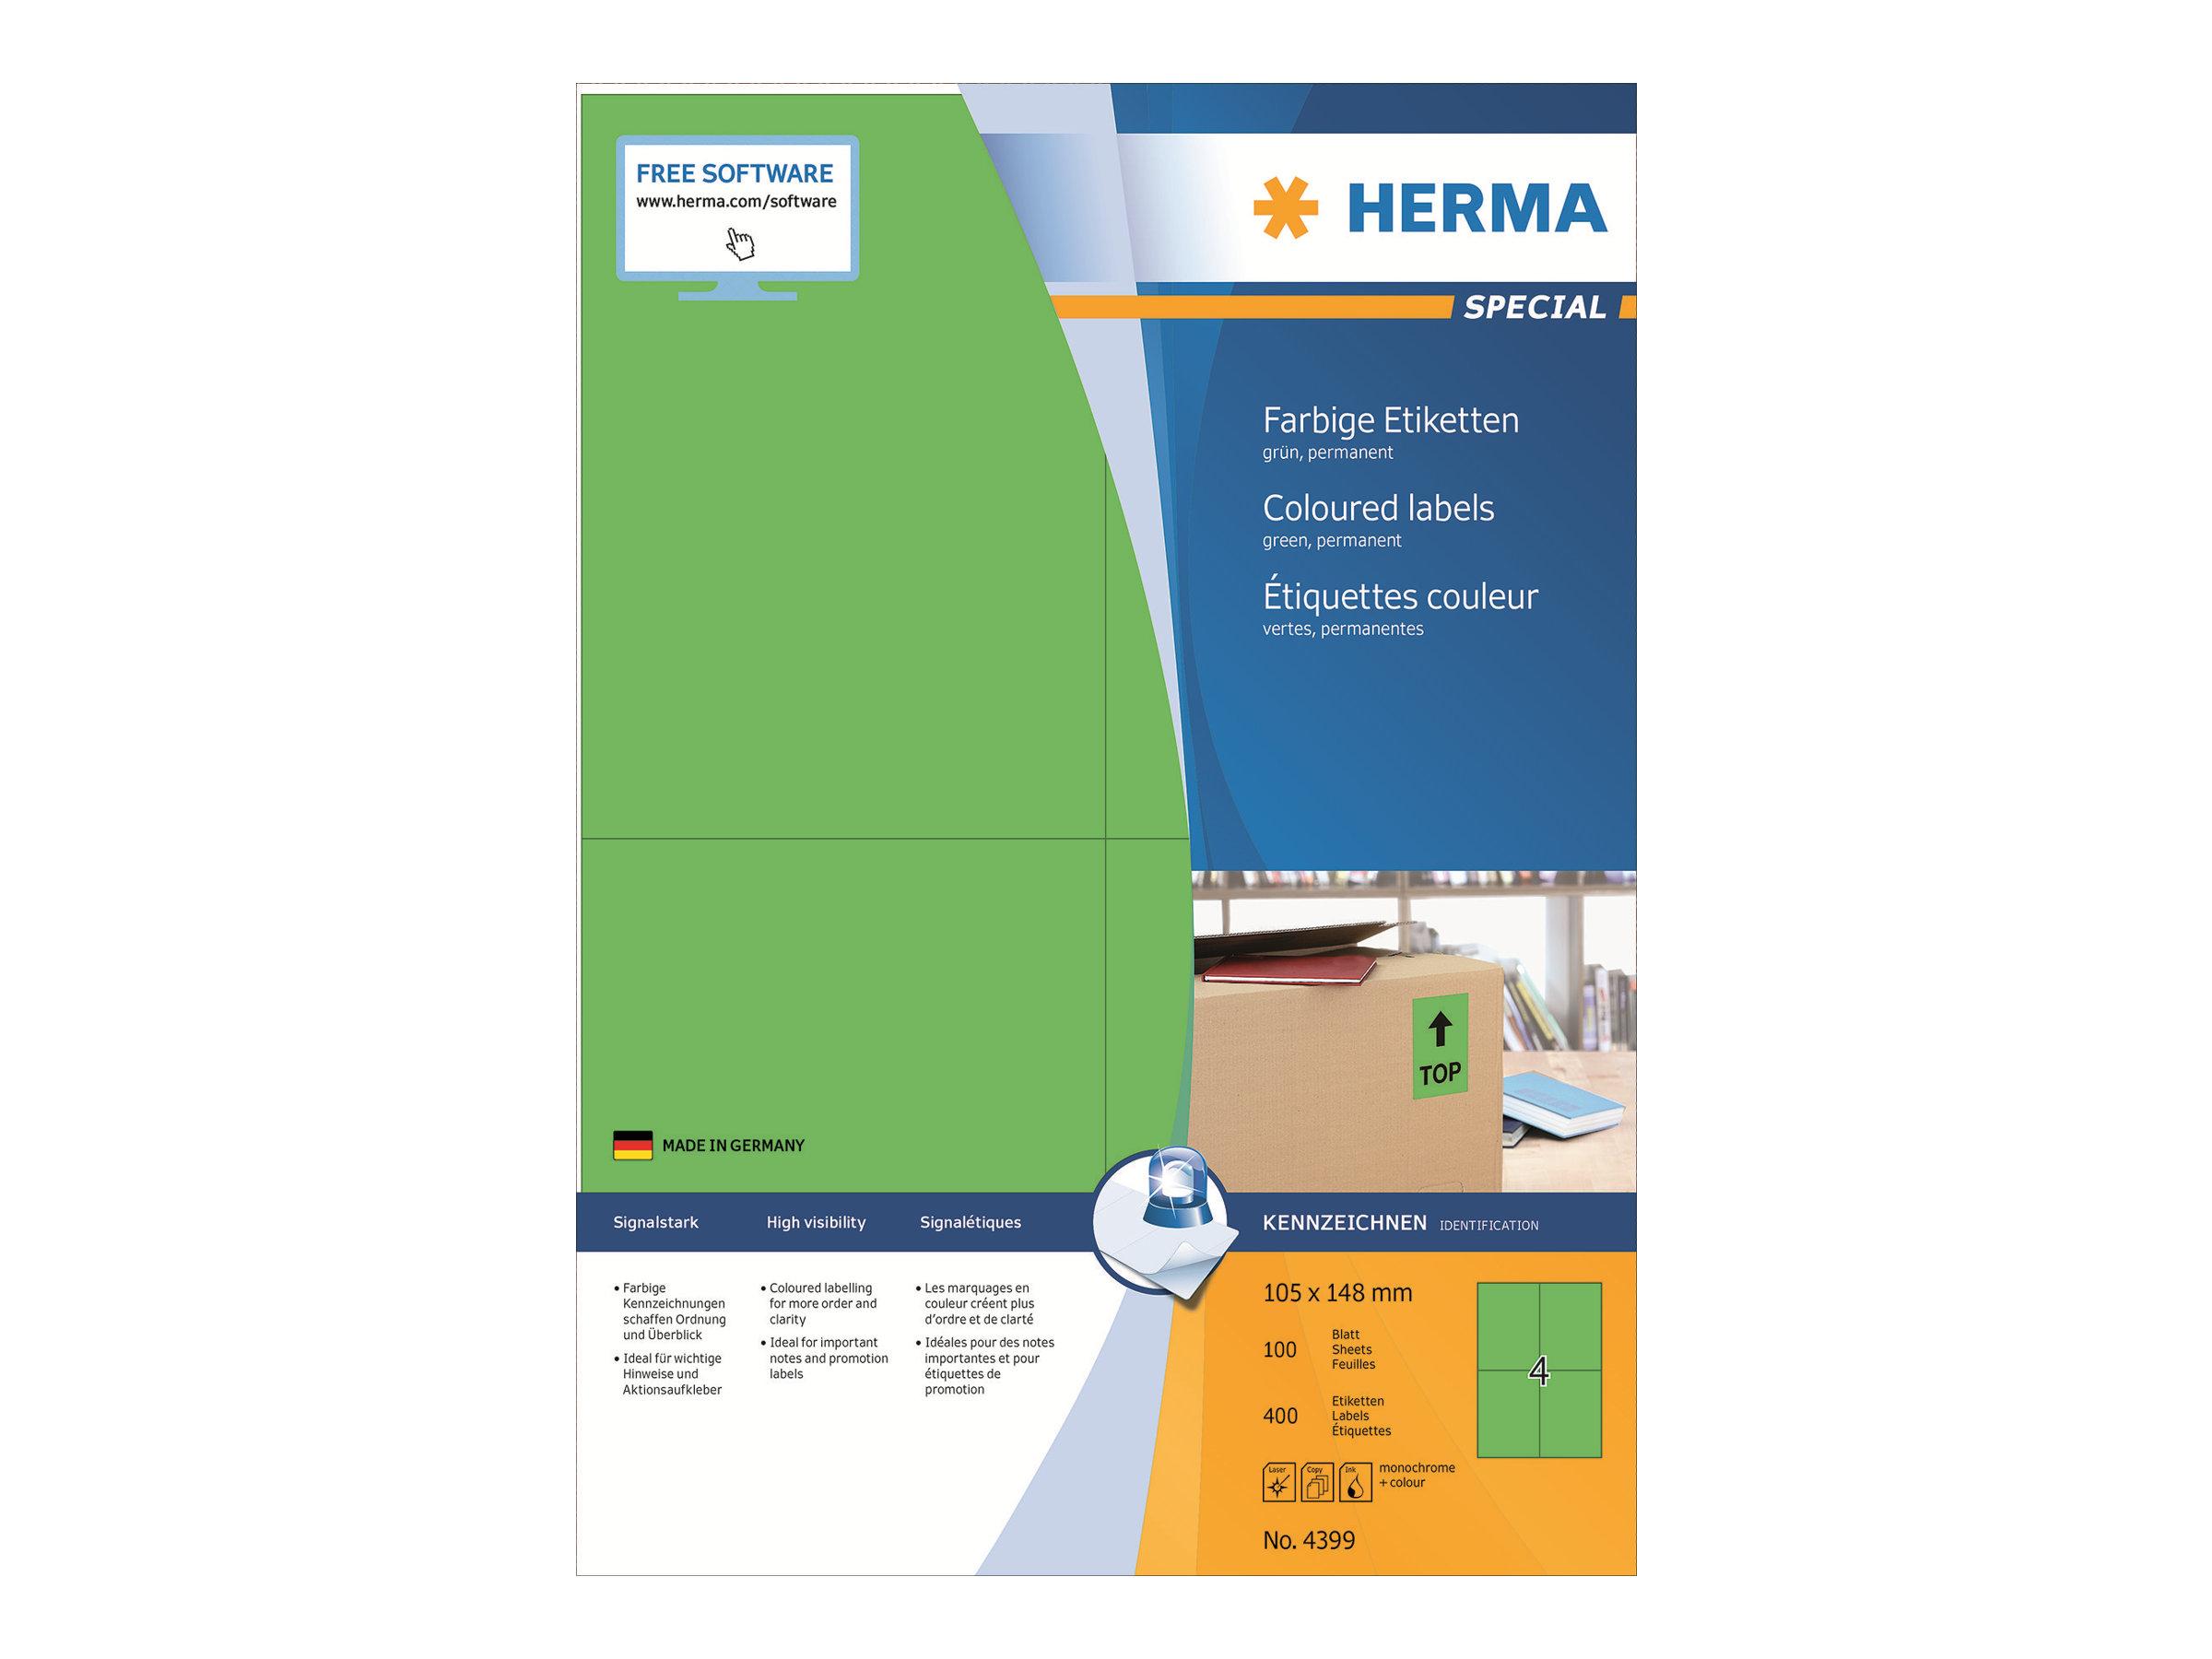 HERMA Special - Papier - matt - permanent selbstklebend - grün - A6 (105 x 148 mm)